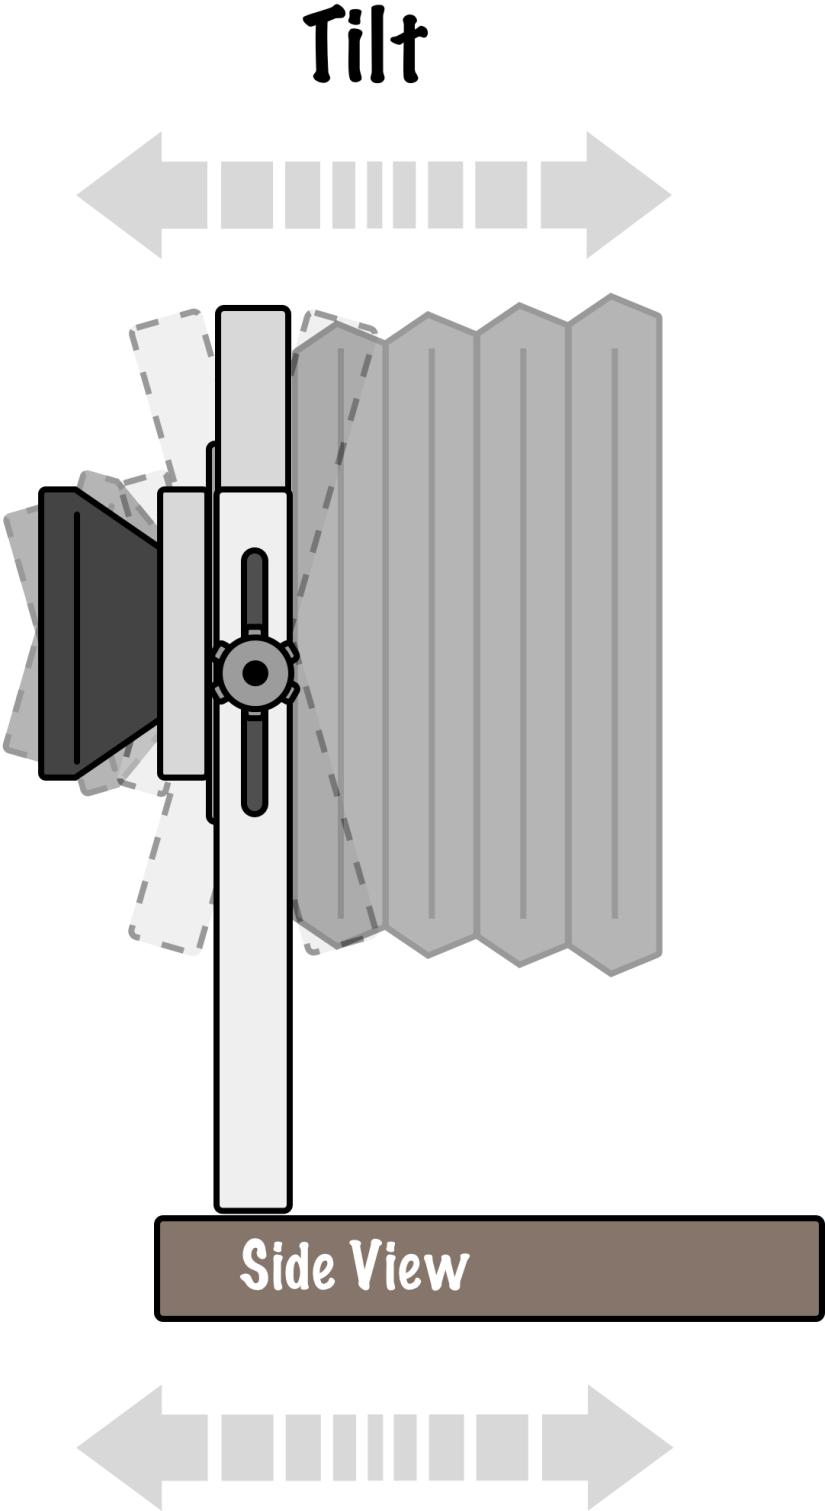 tilt movement on a view camera